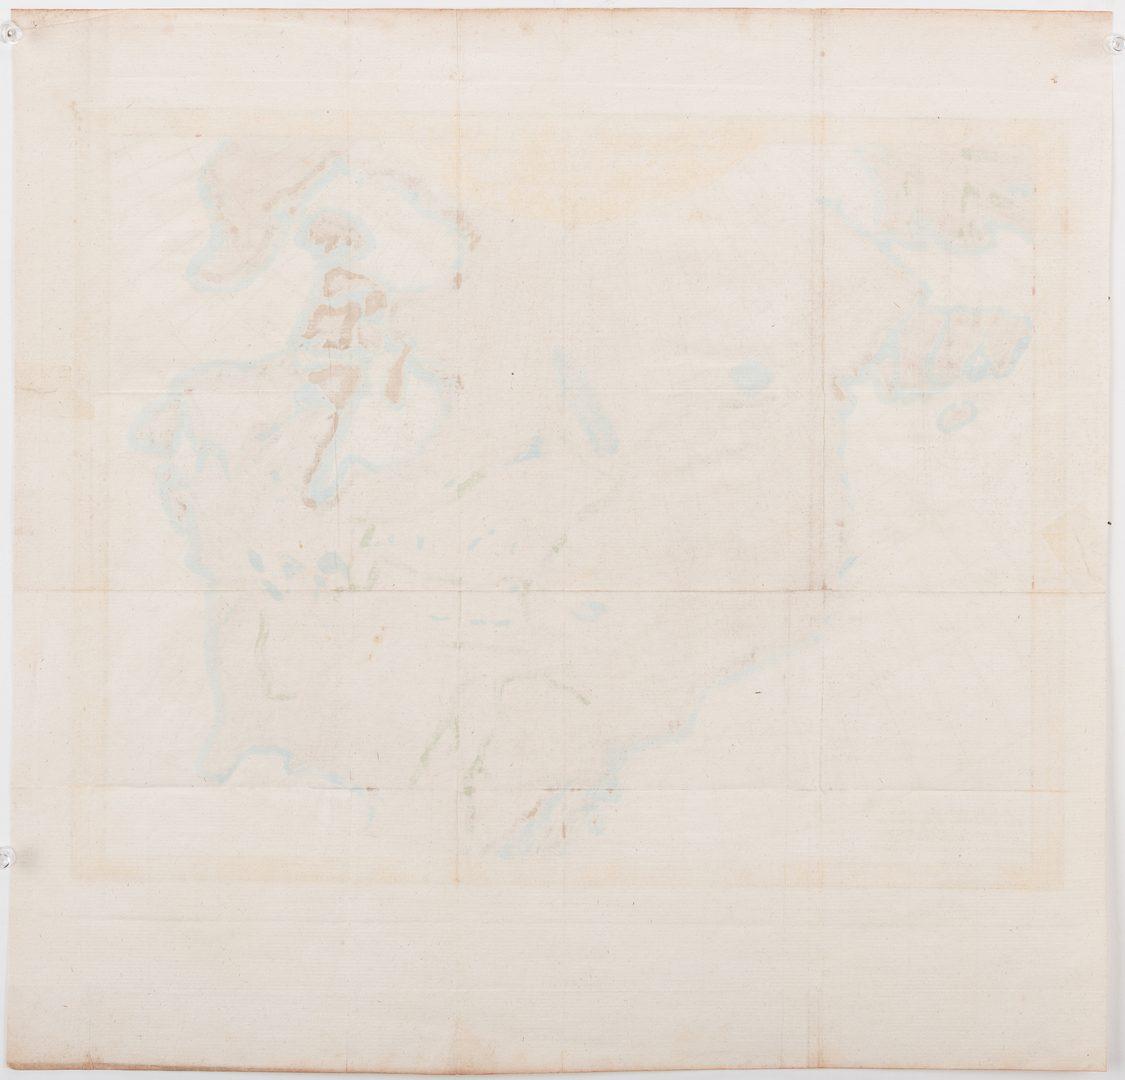 Lot 540: 2 18th Cent. Maps, inc. Van Jagen & Vaugondy